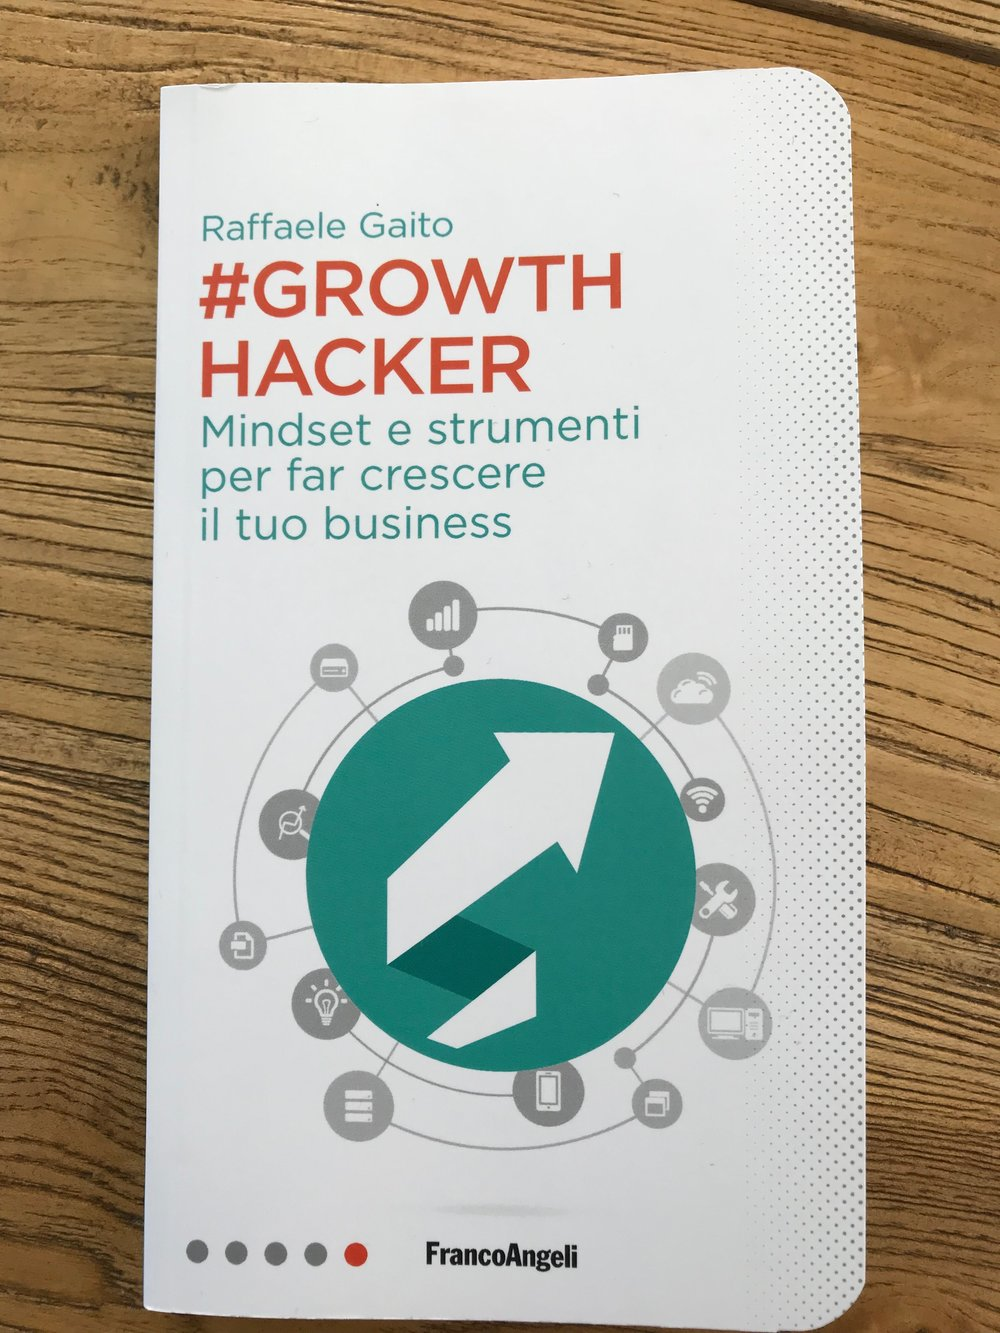 Raffaele Gaito Hrowth Hacker